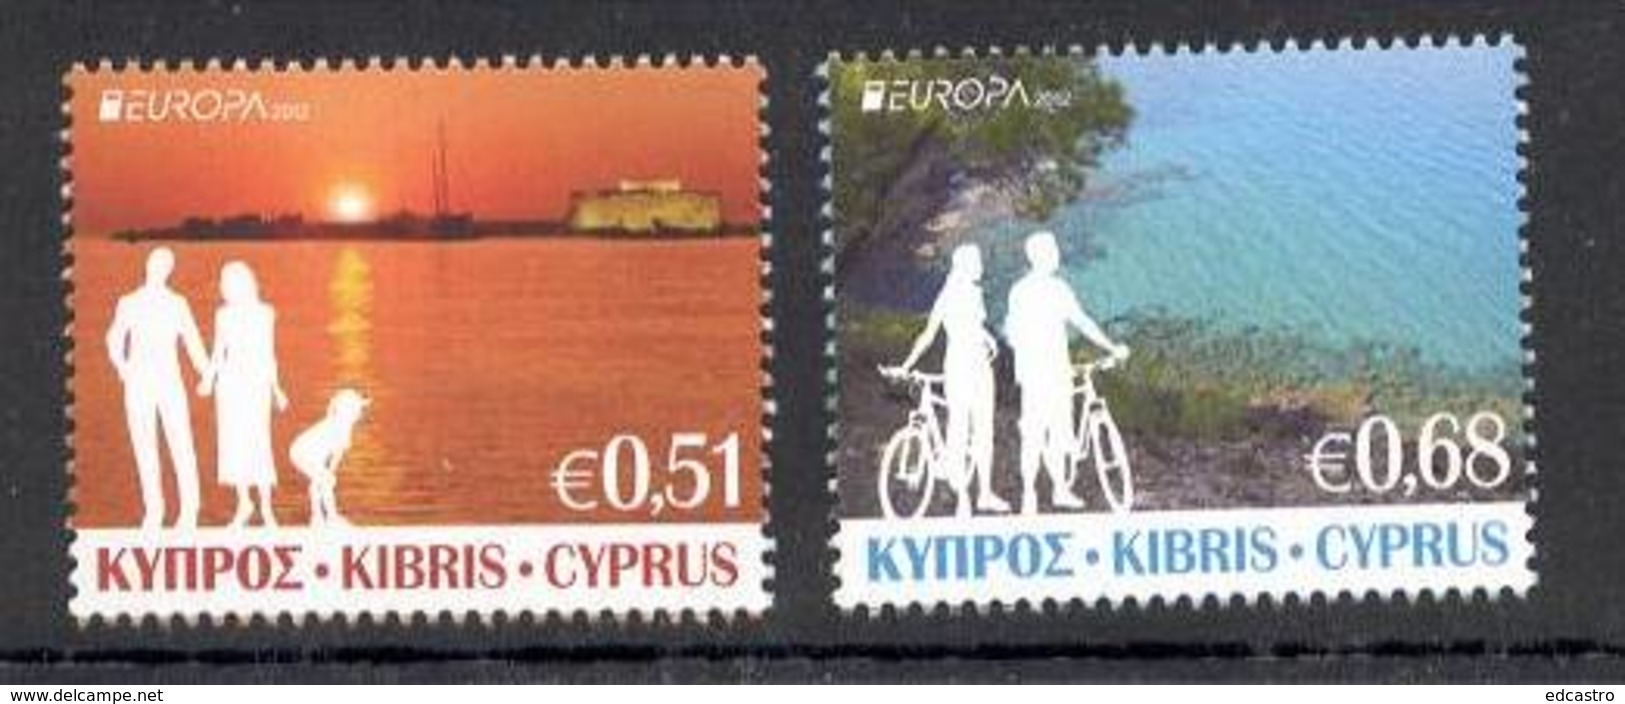 1.- CYPRUS CHYPRE 2012 EUROPA 2012 VISITS EUROPA - 2012